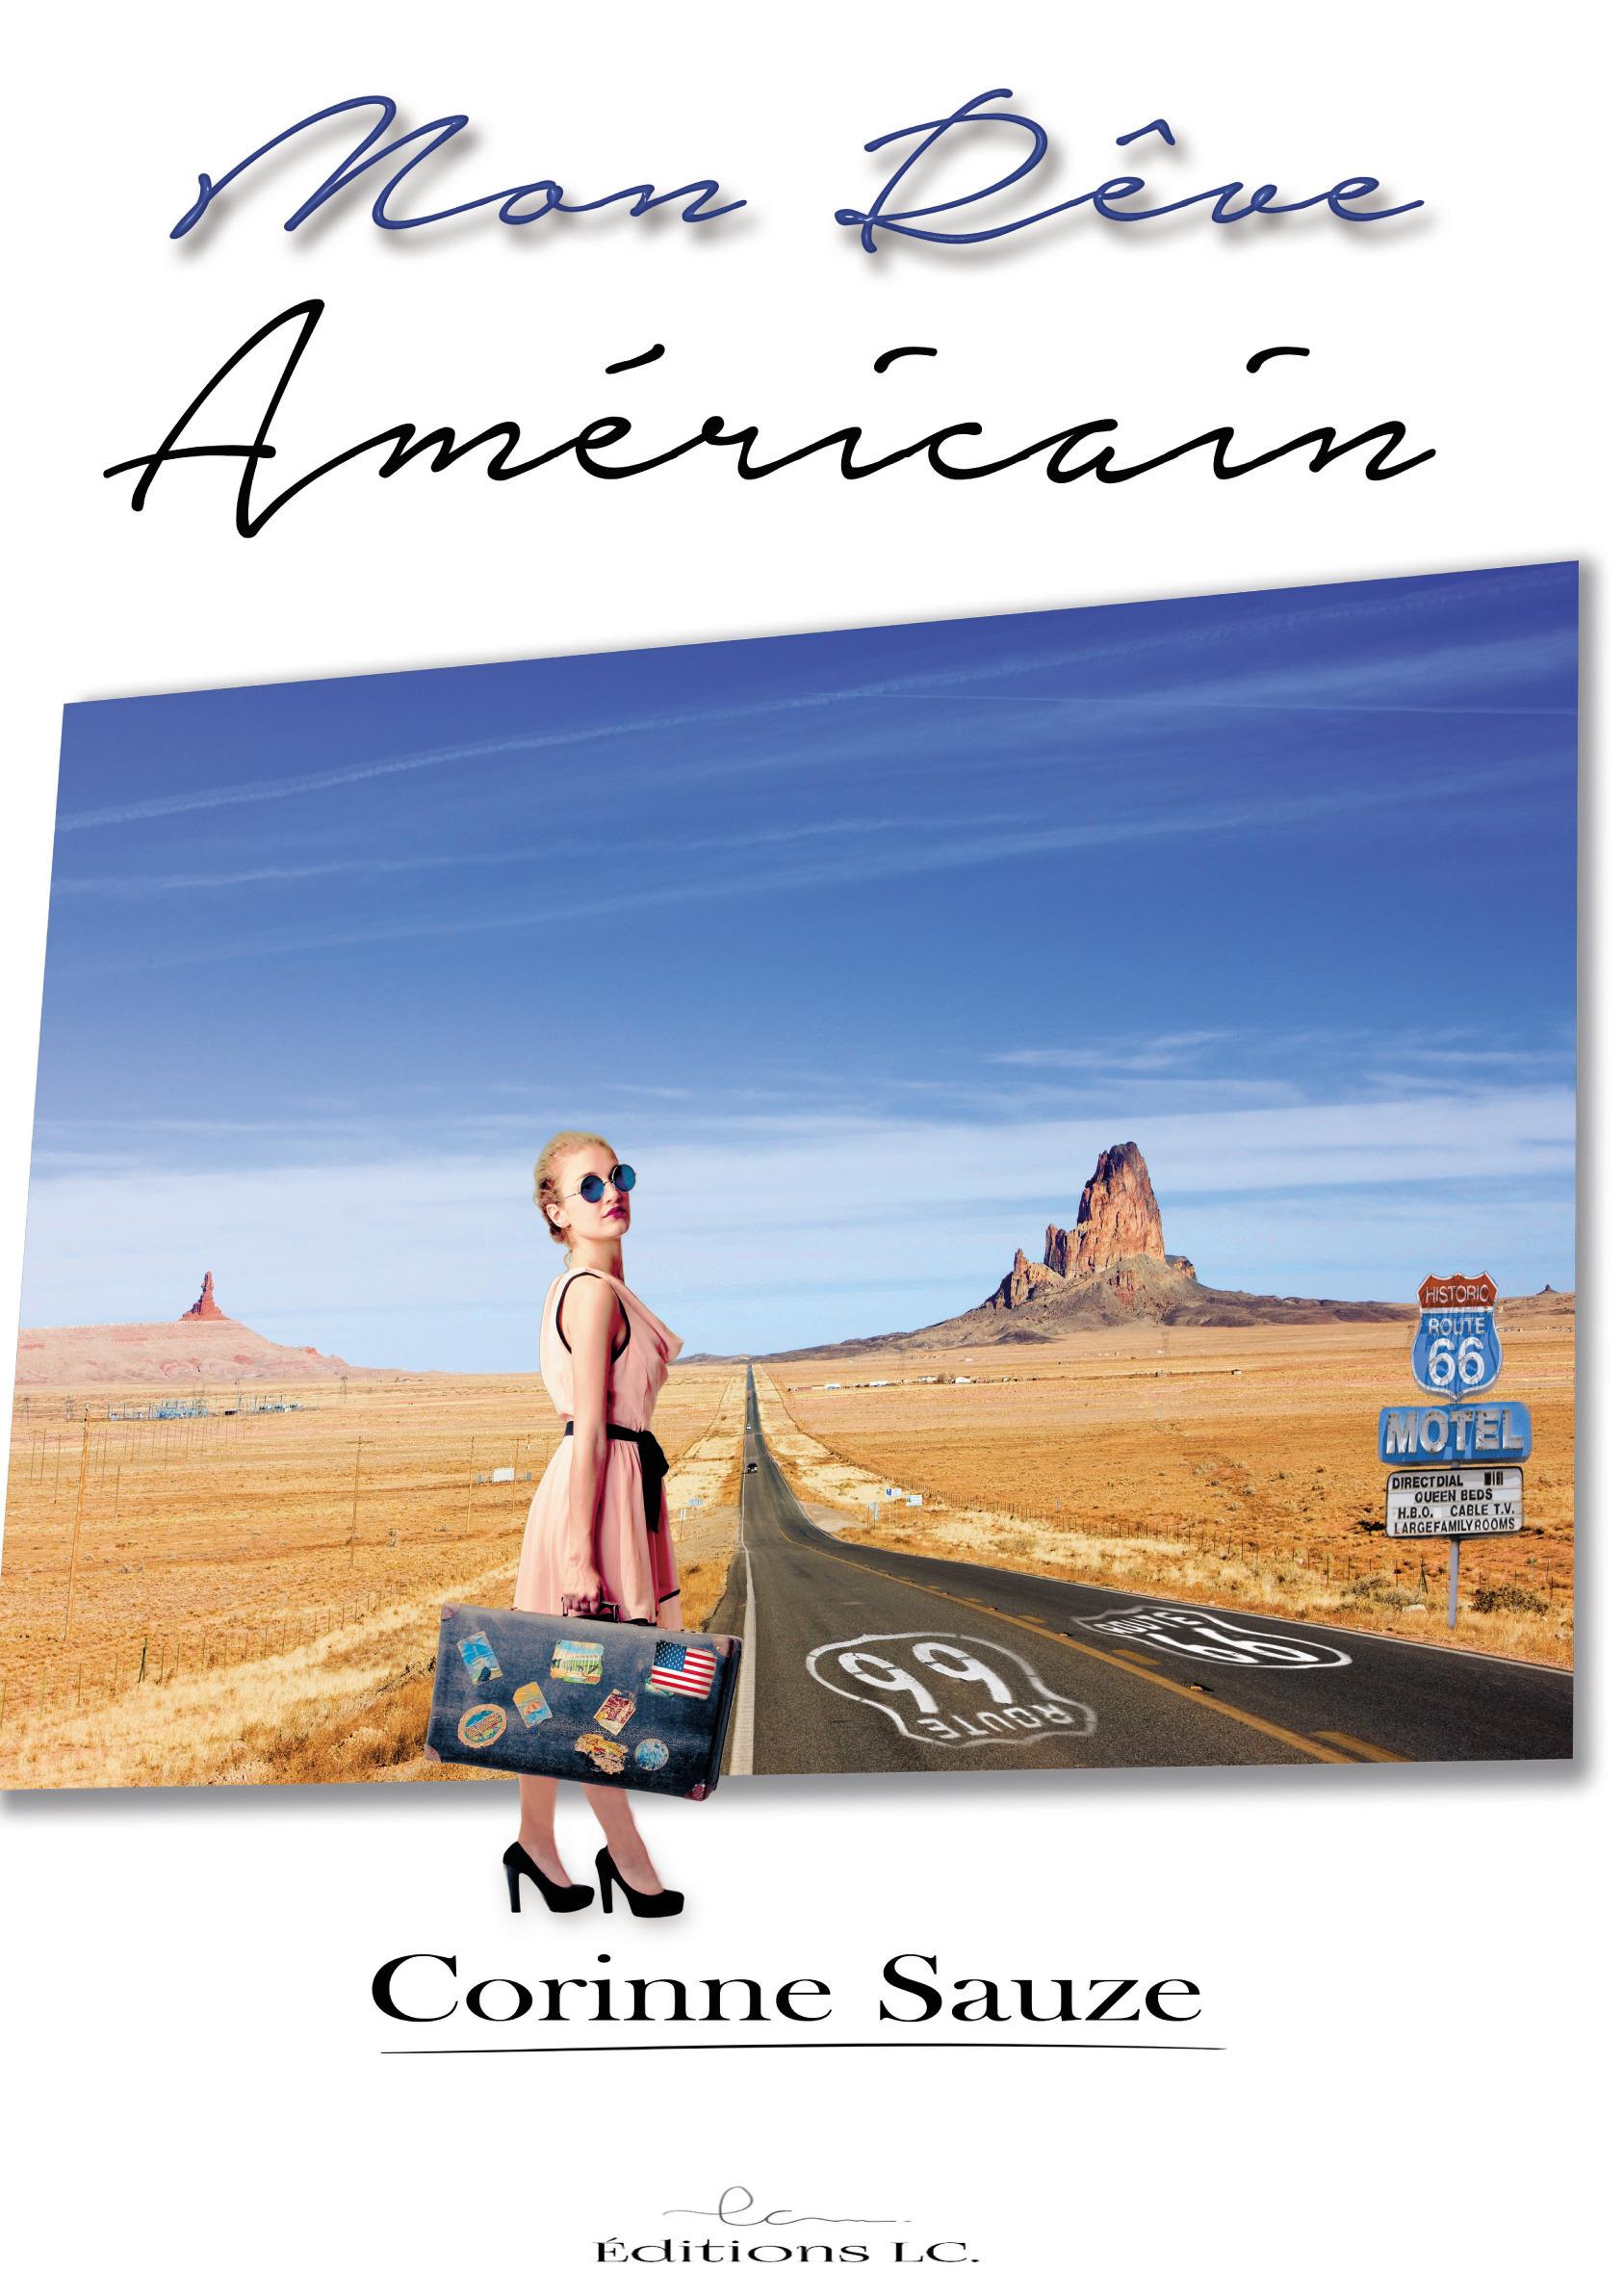 Mon rêve américain